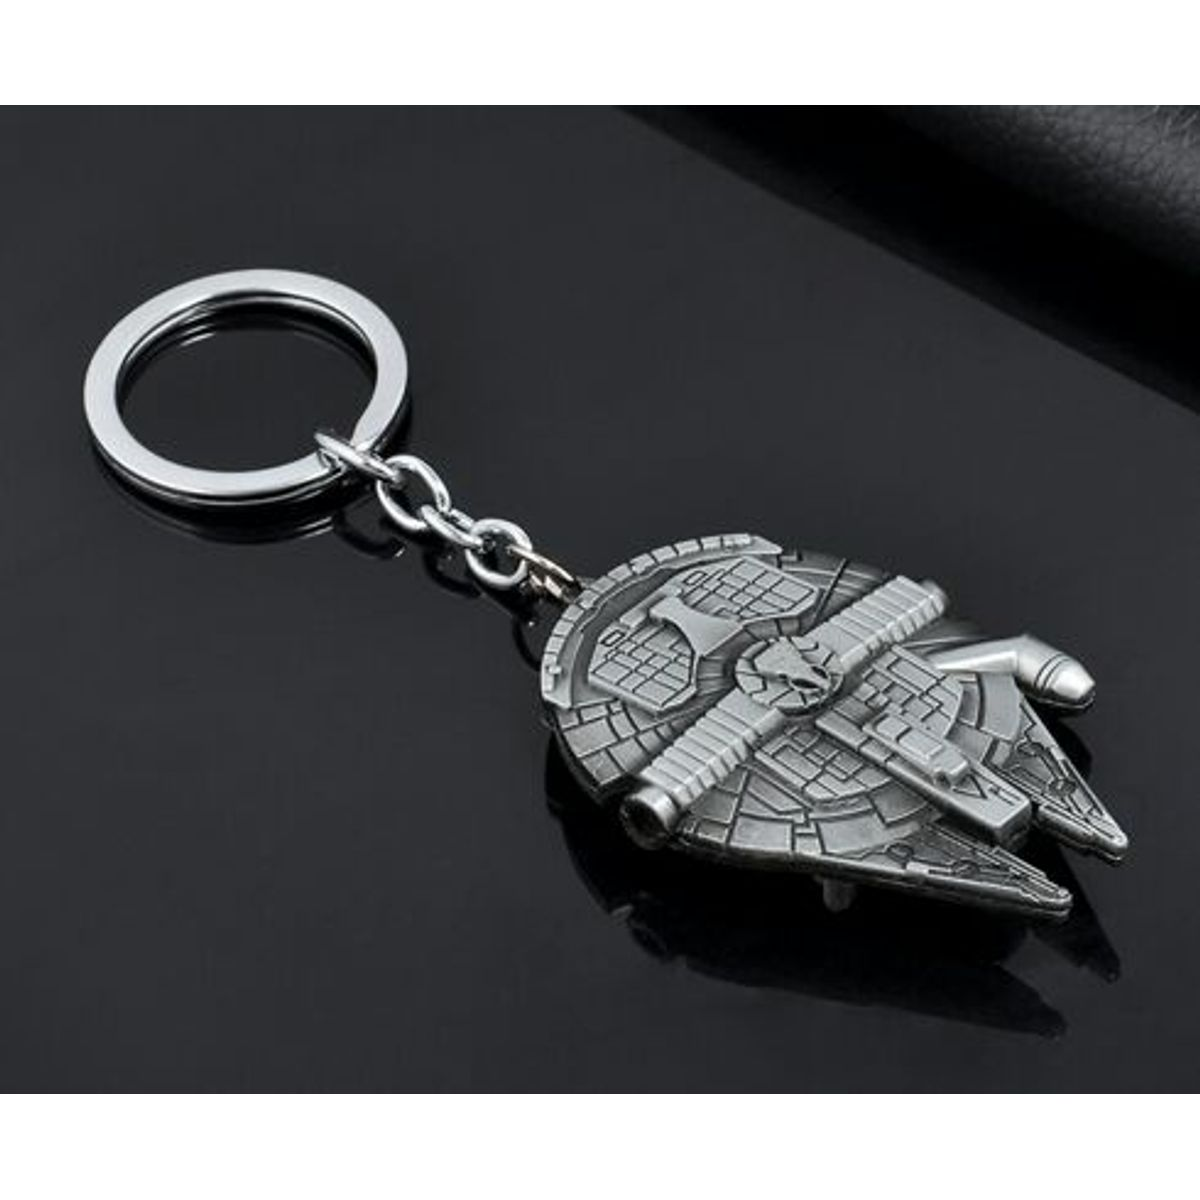 STAR WARS - Millennium Falcon - Han Solo Ship - Metal Keychain